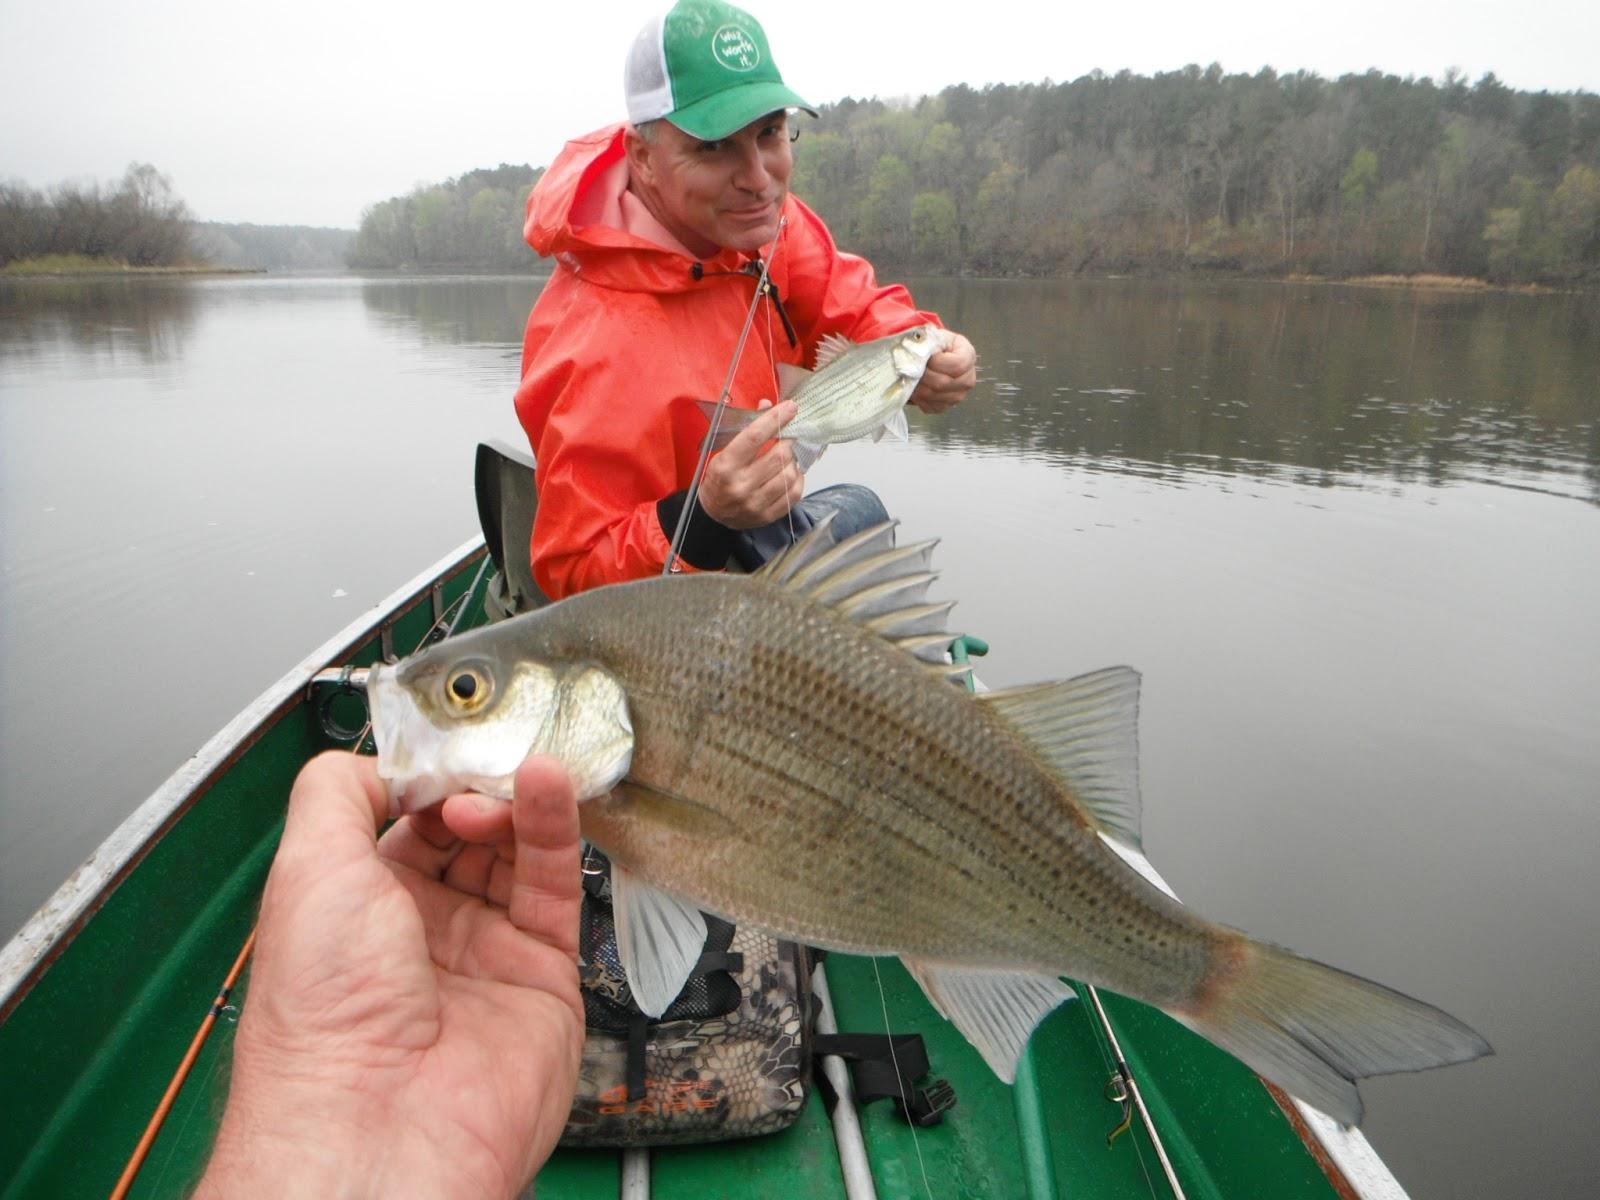 North Carolina River Fishing And Canoeing With Mack White